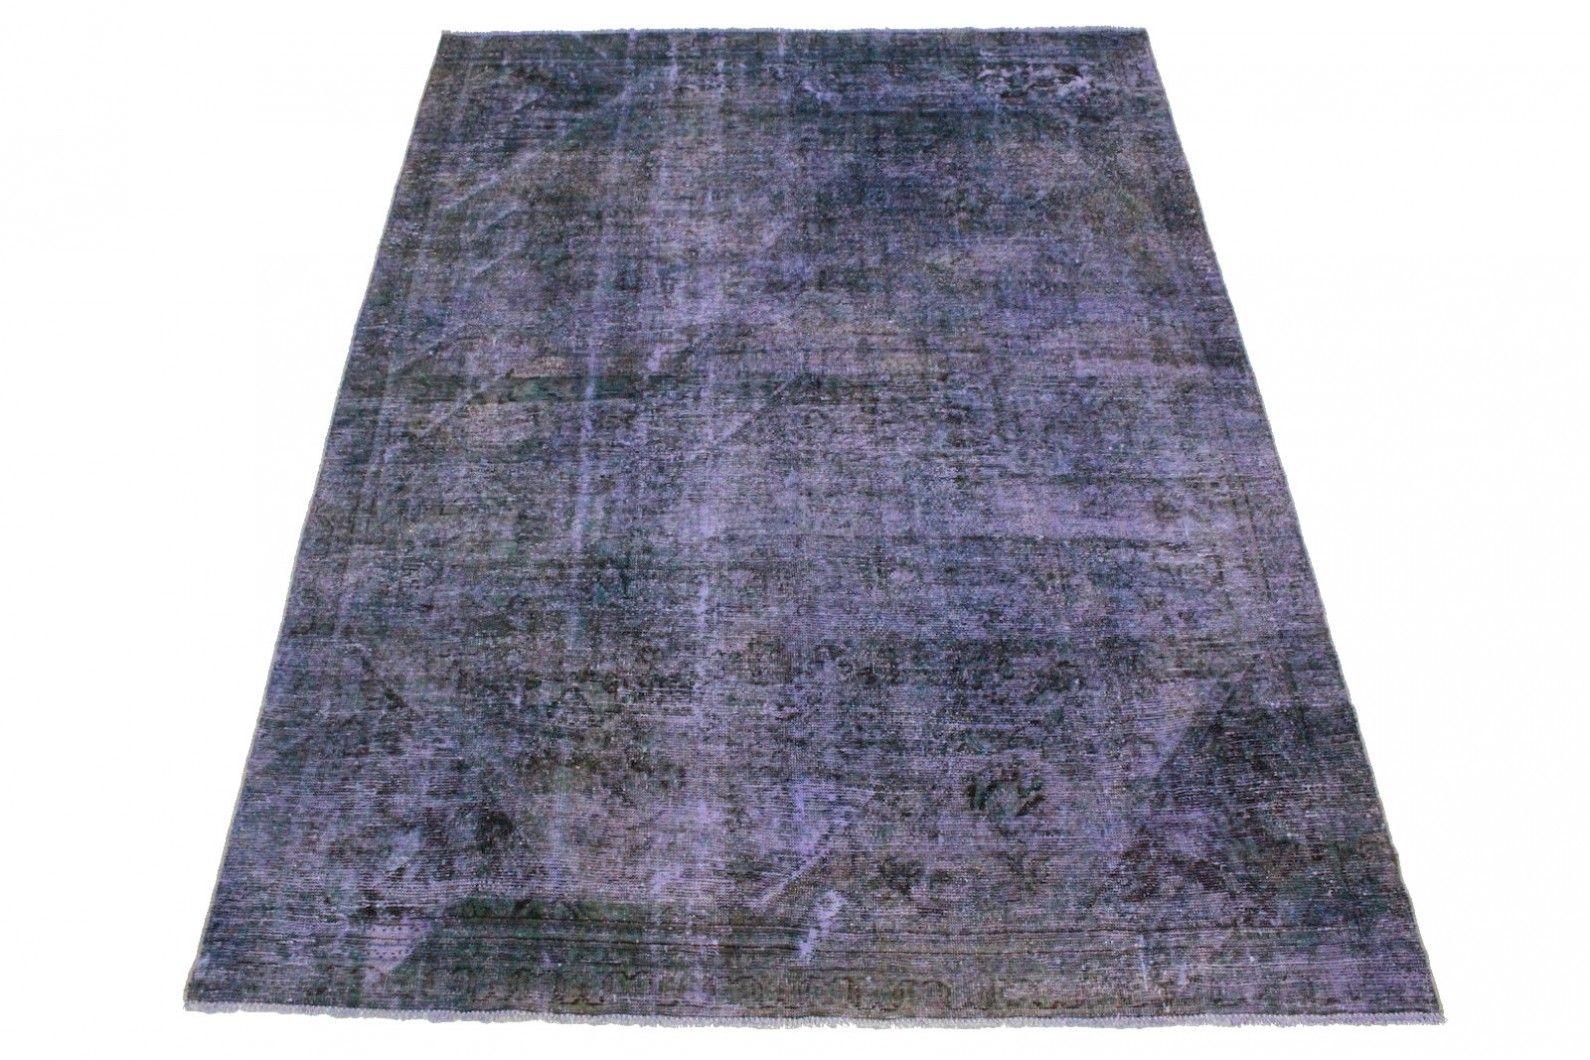 Vintage Teppich Lila In 320x220cm Lila Teppich Vintage Teppiche Teppich